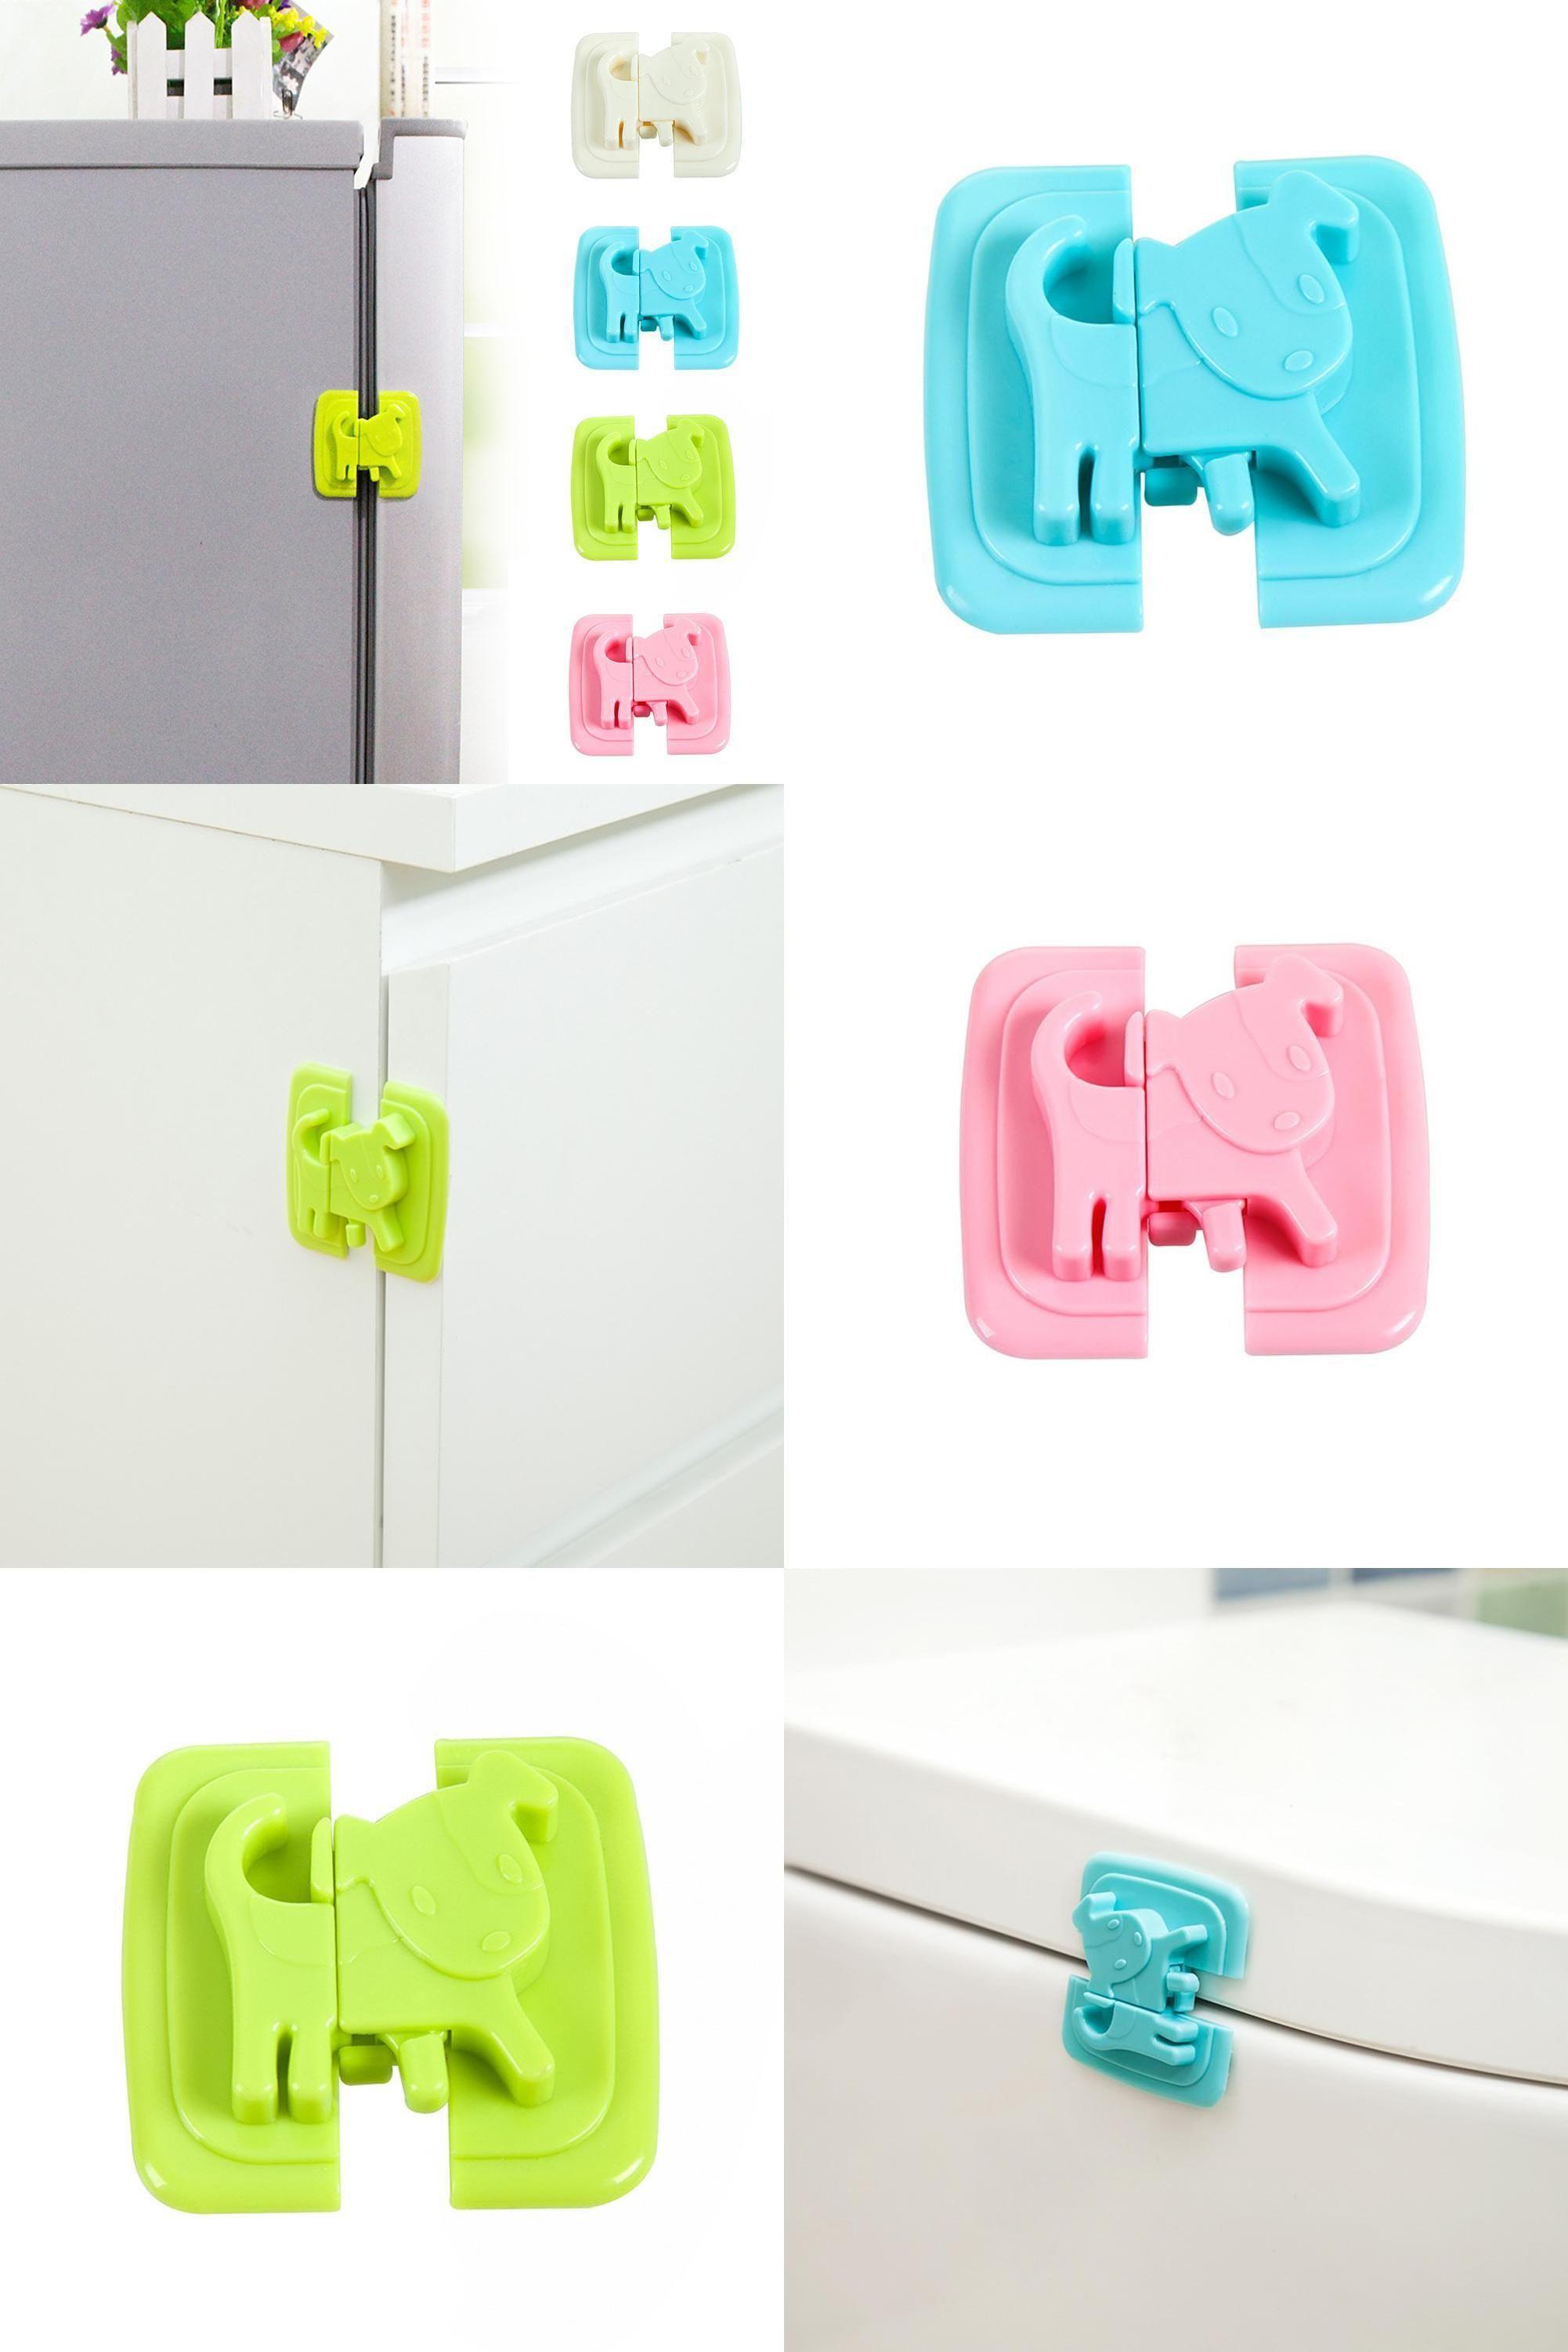 [Visit to Buy] Baby Care Locks Cartoon Shape Cupboard Door